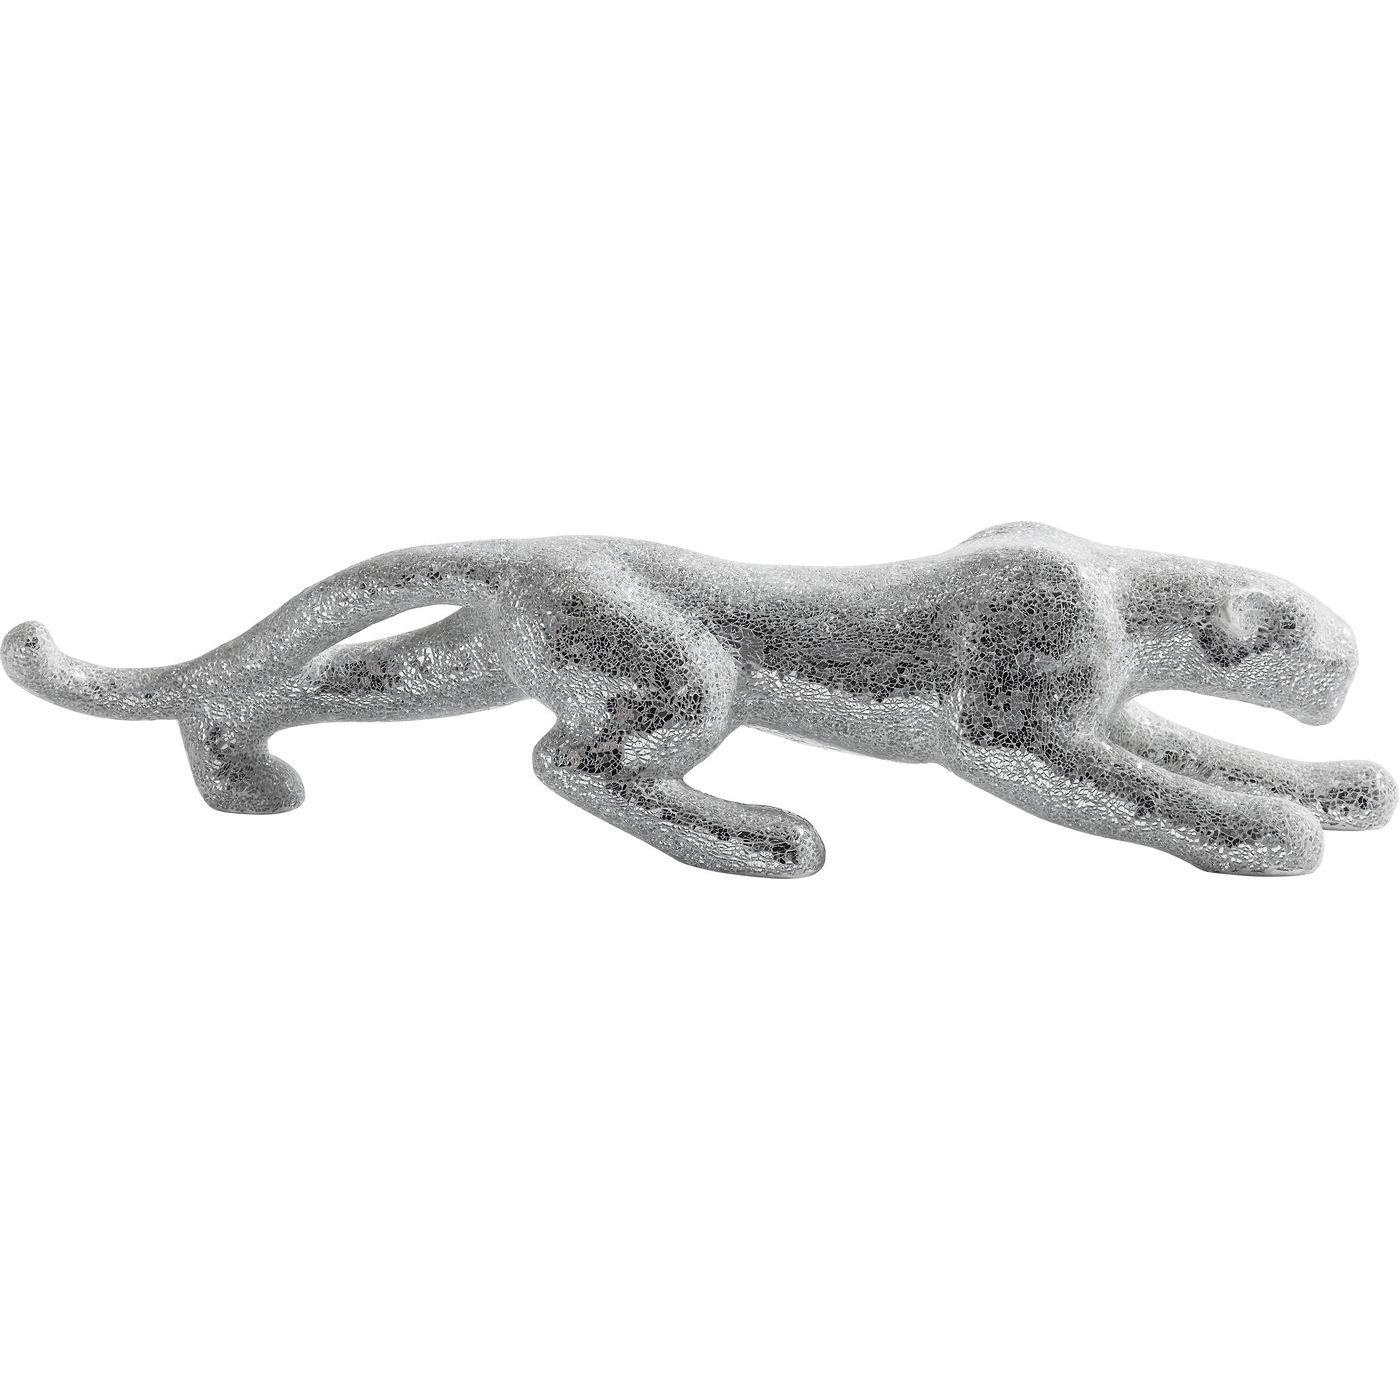 Image of   KARE DESIGN Skulptur, Mosaik Panther Deluxe